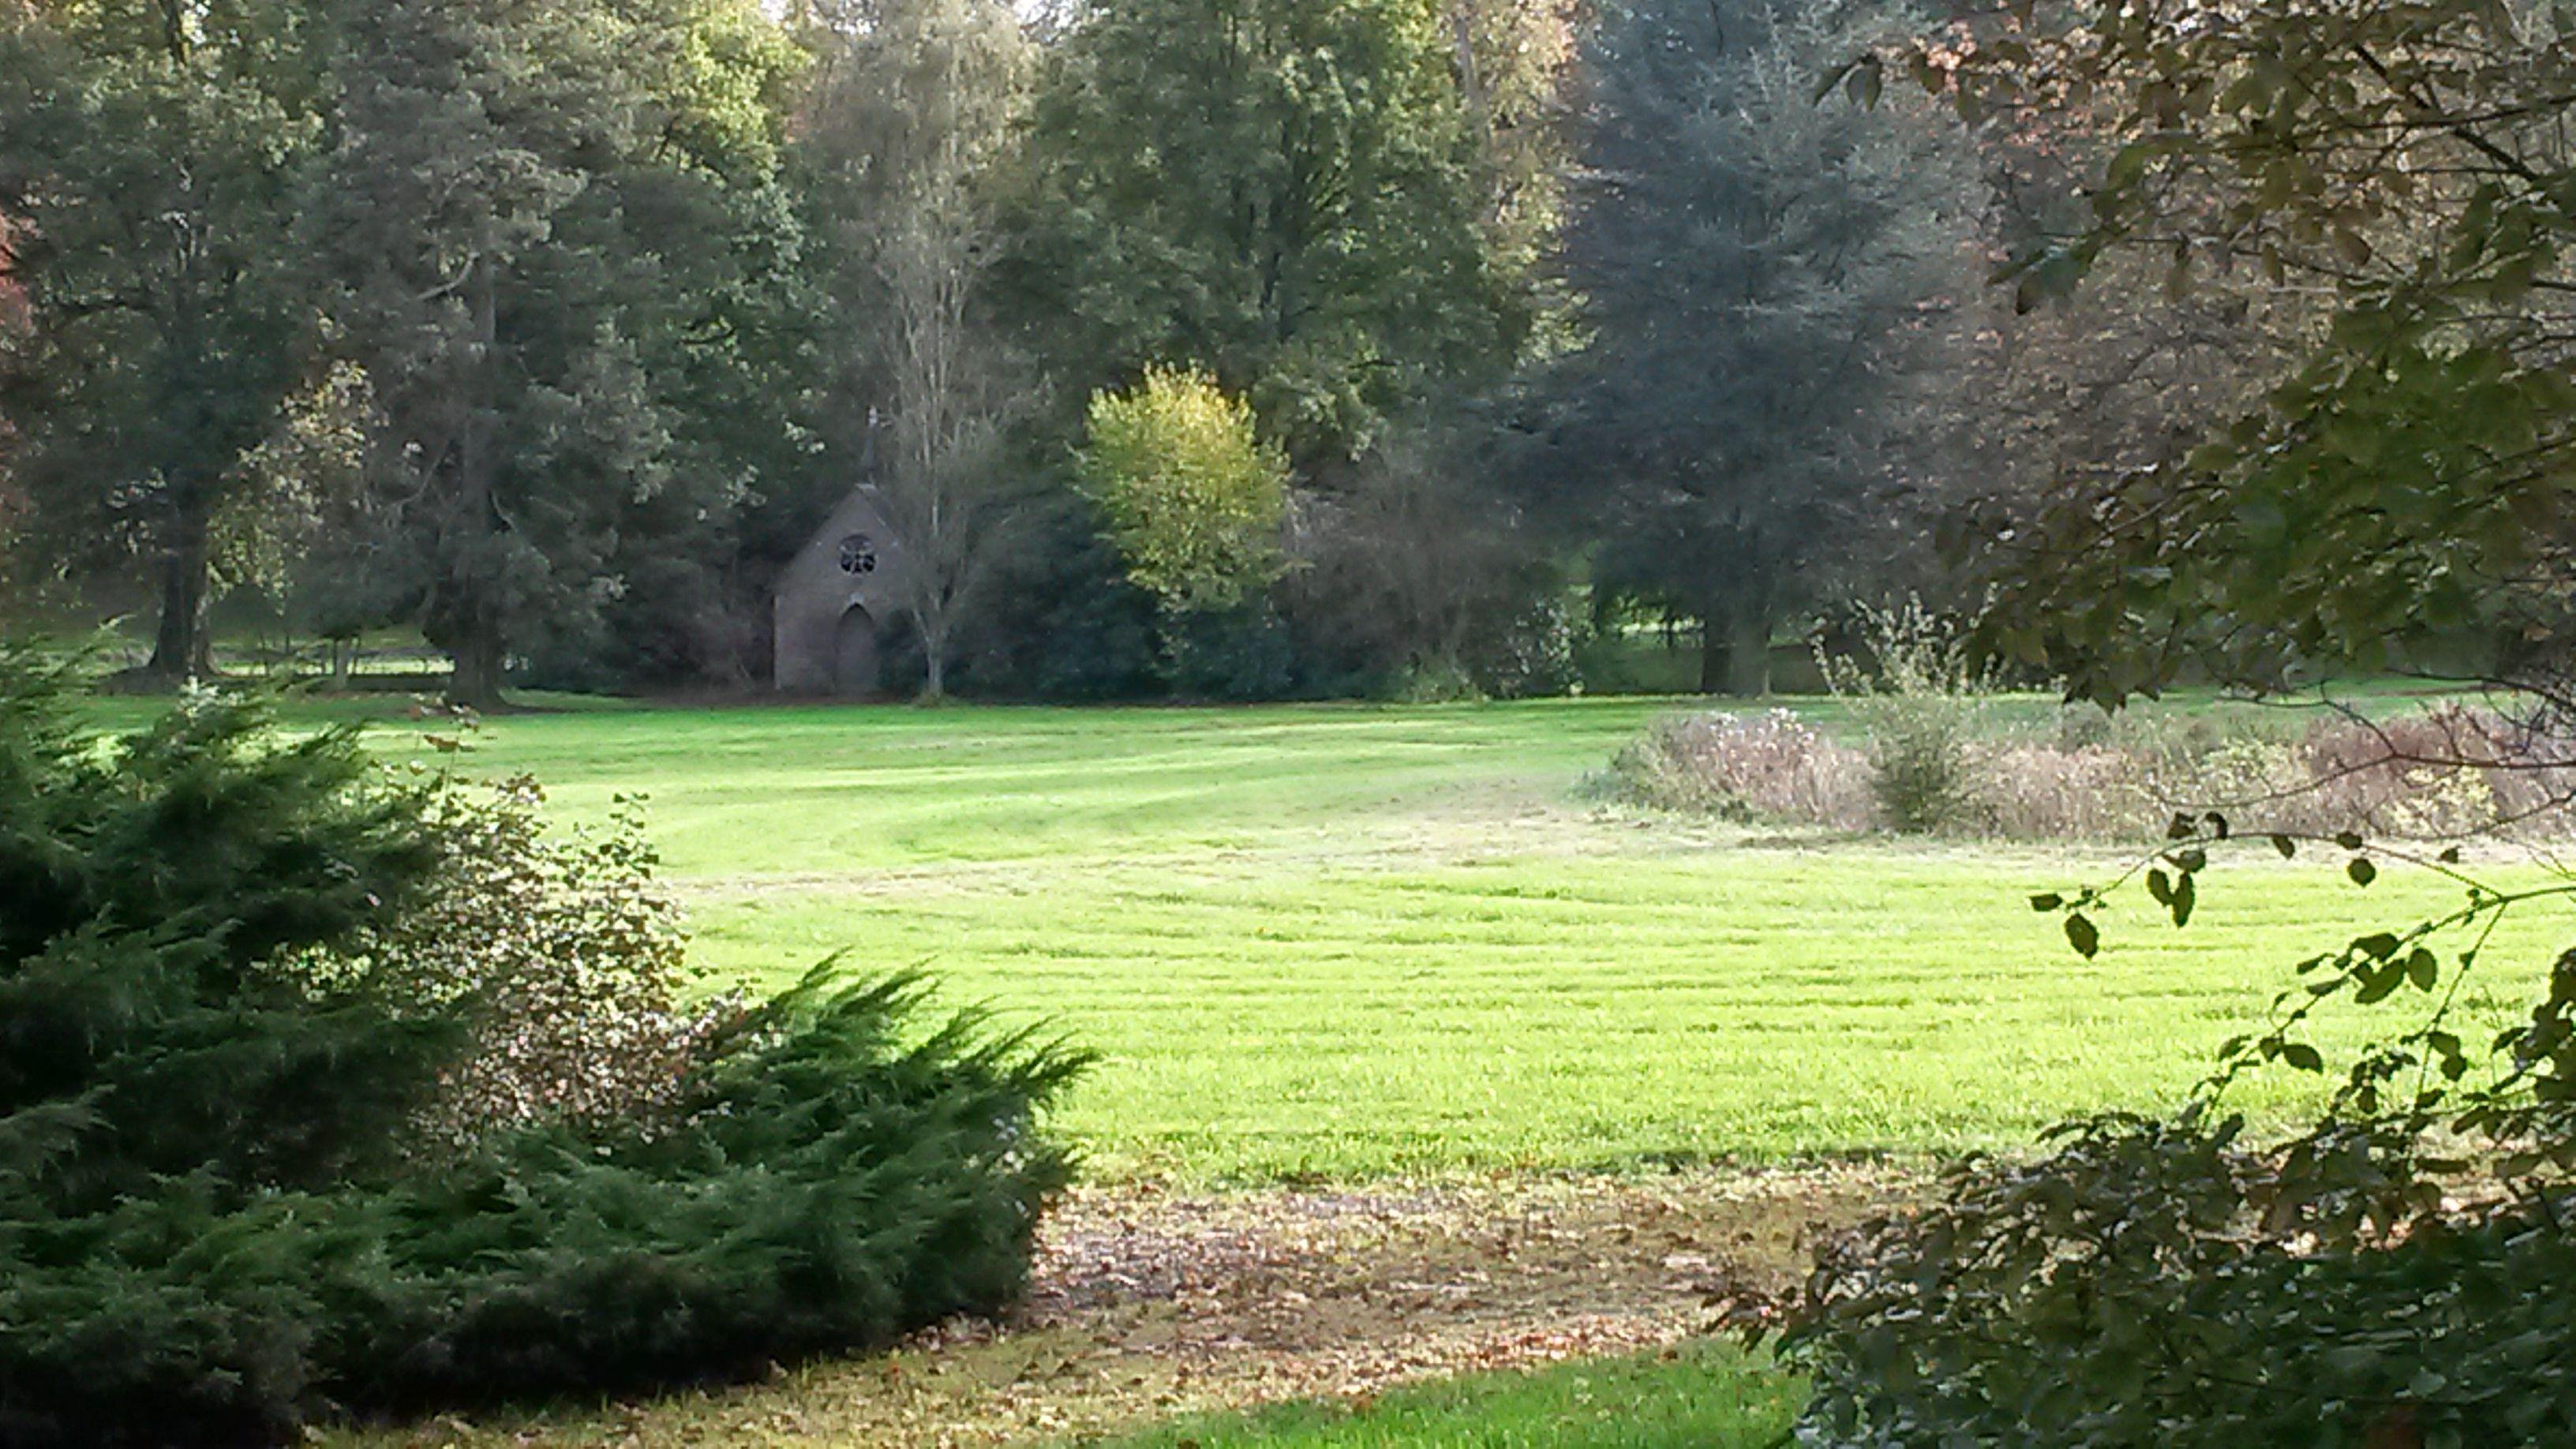 Het tuinhuisje van het chateau.